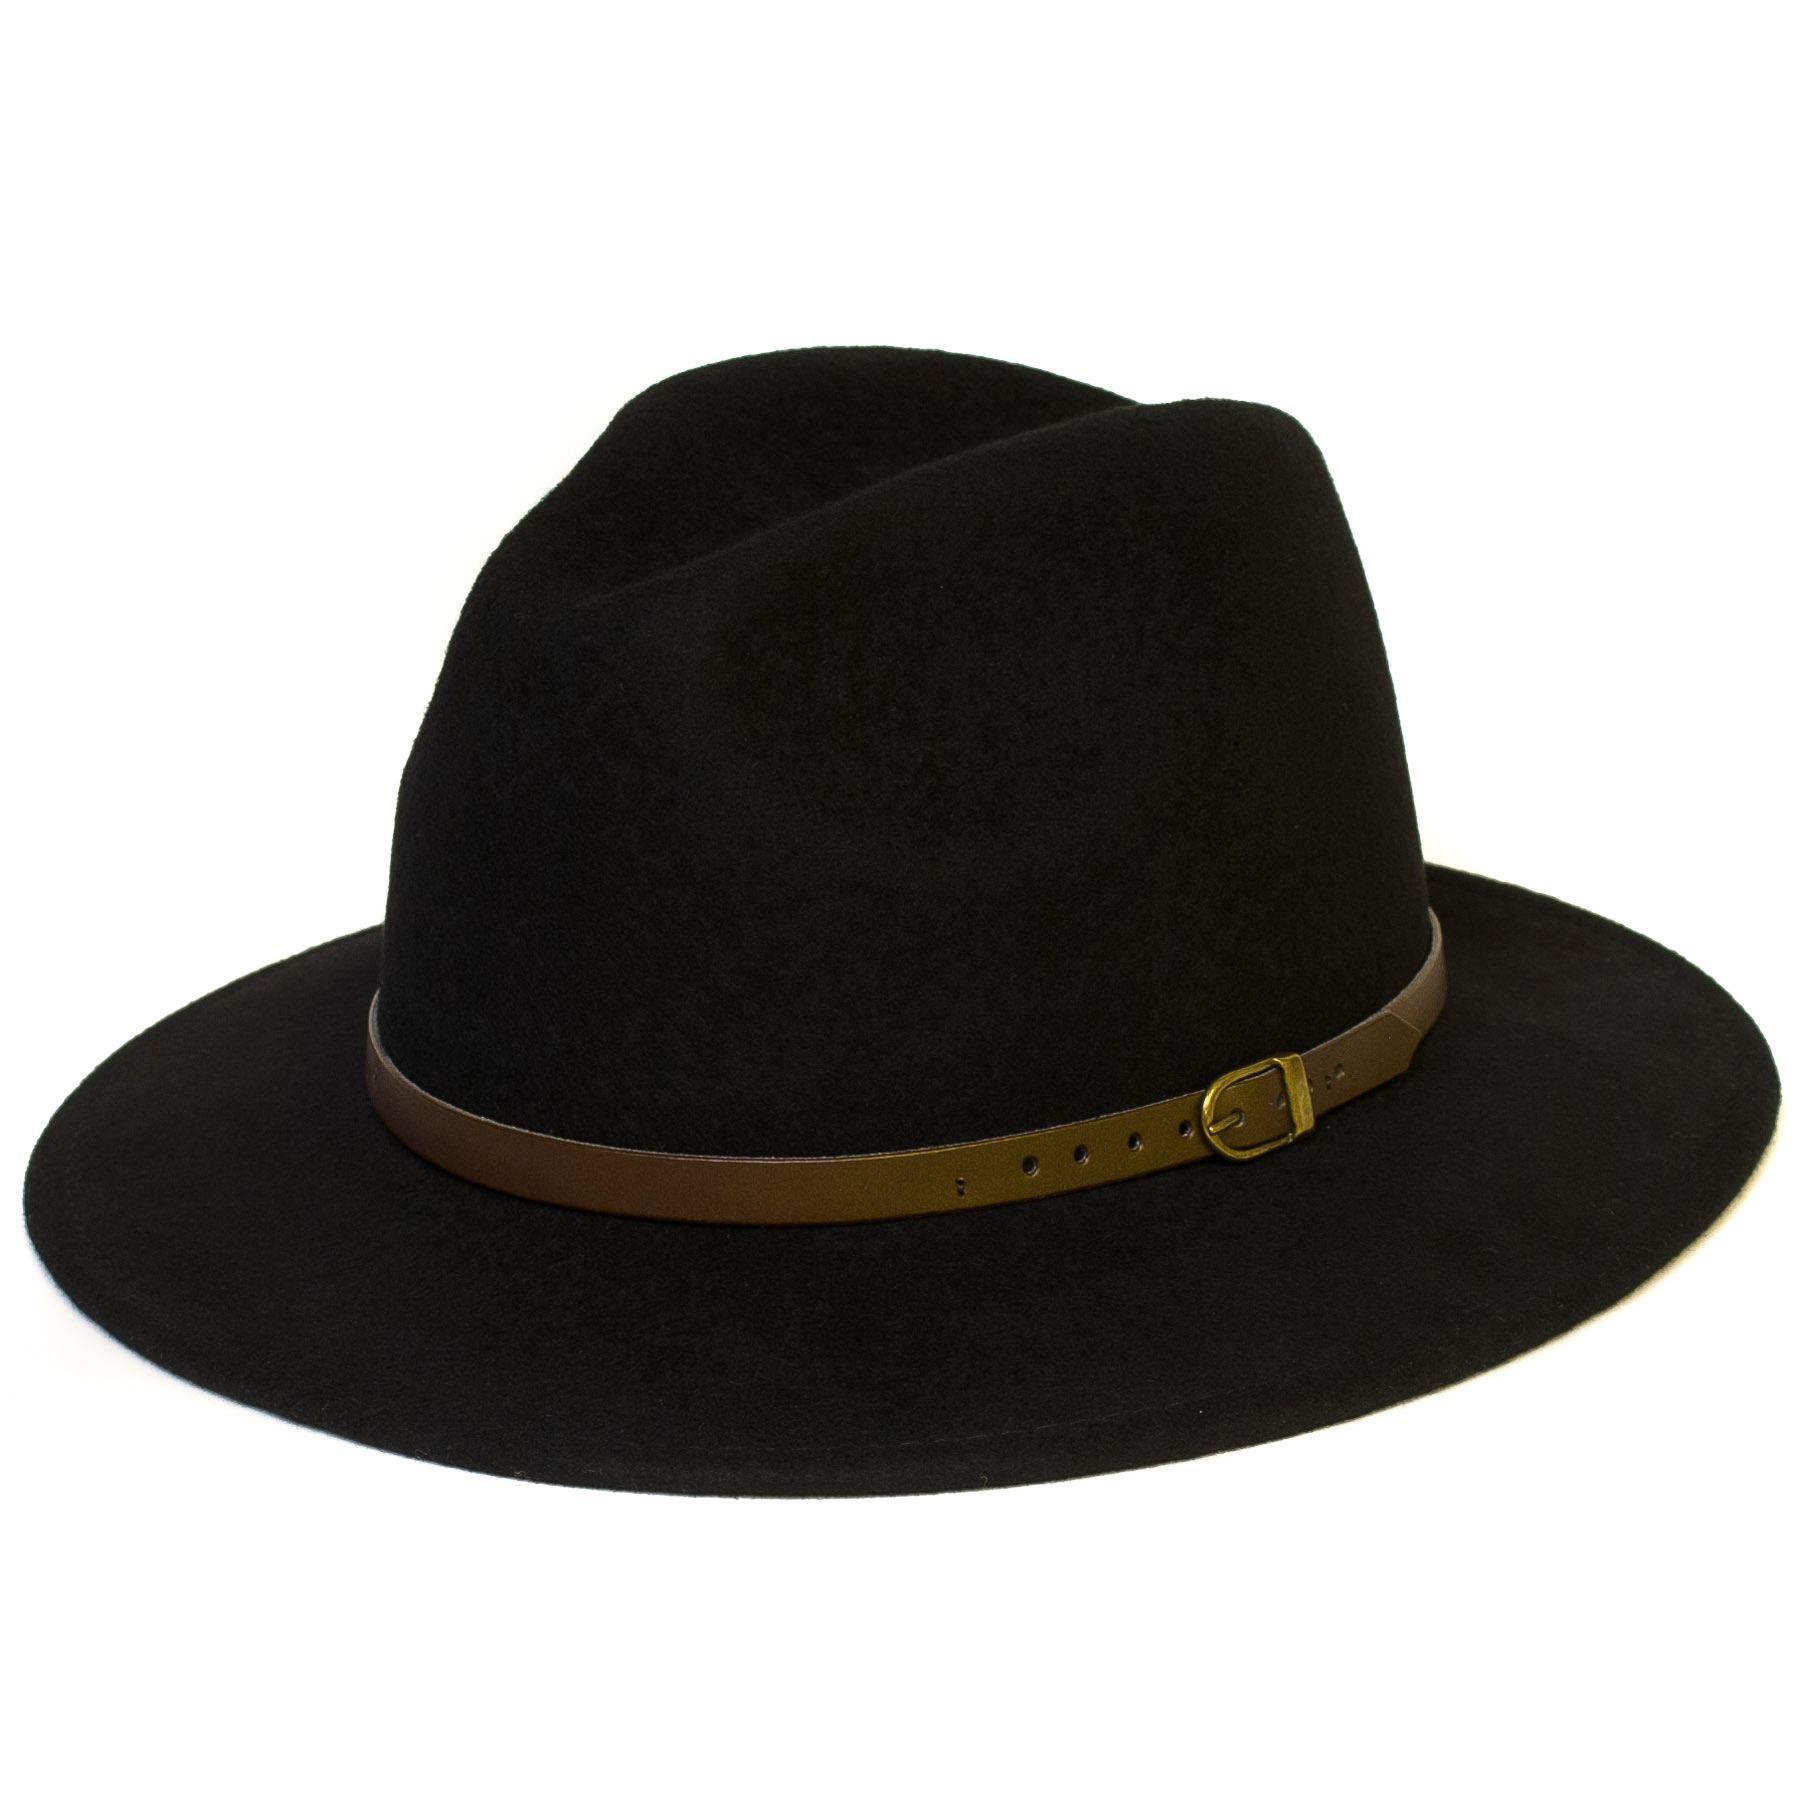 Sombrero-Trilby-Fedora-De-Fieltro-De-Lana